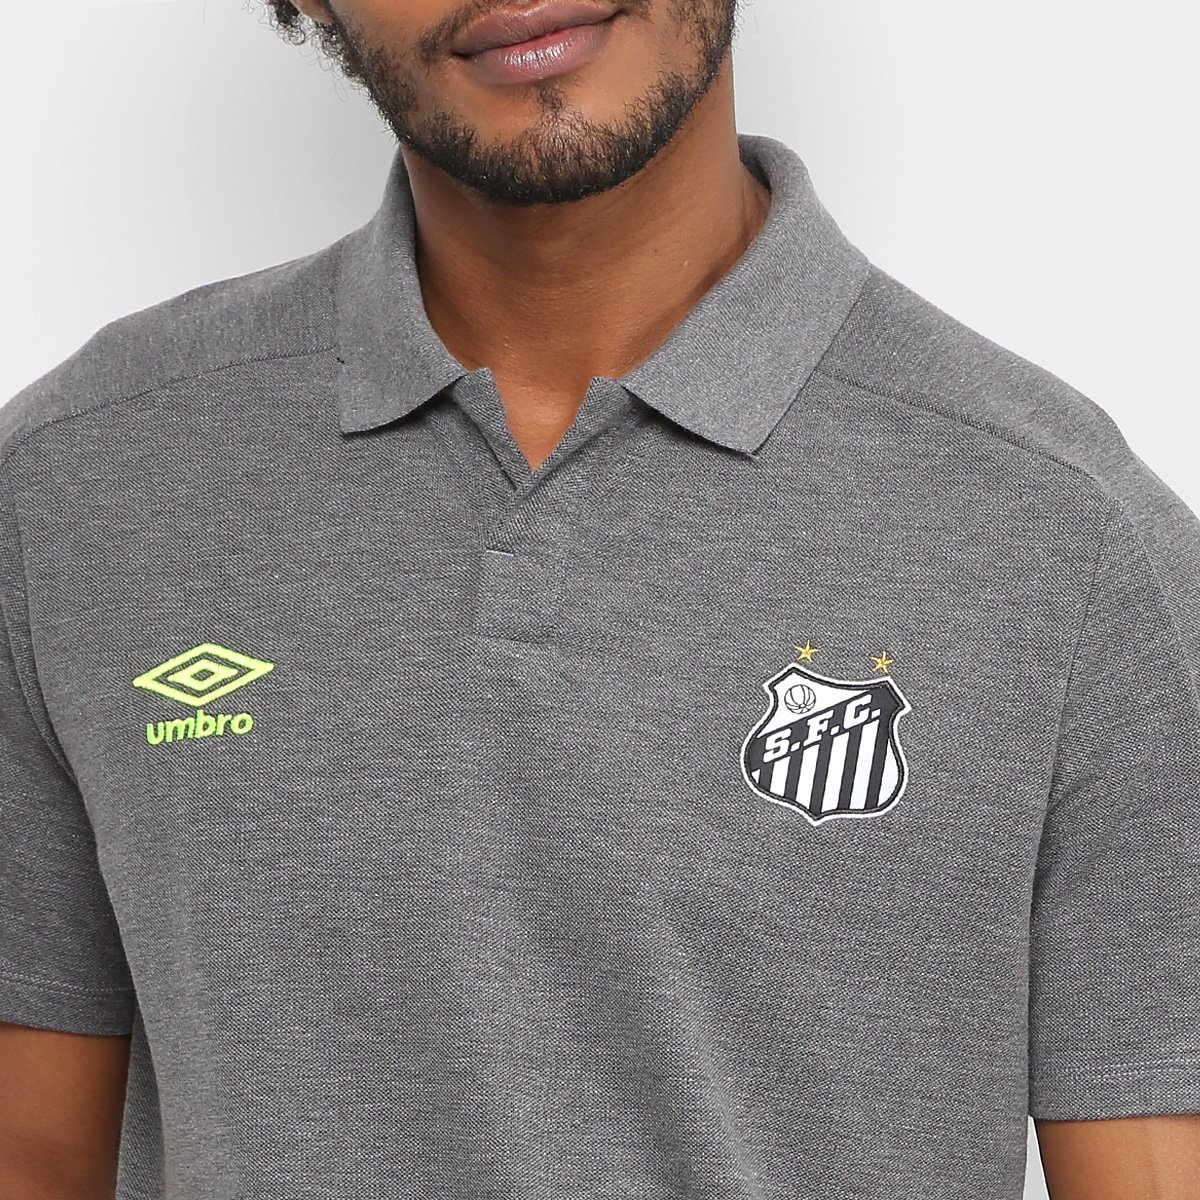 dd4bd08c2f Camisa Polo Santos 2018 Viagem Umbro Masculina - Chumbo - Compre ...